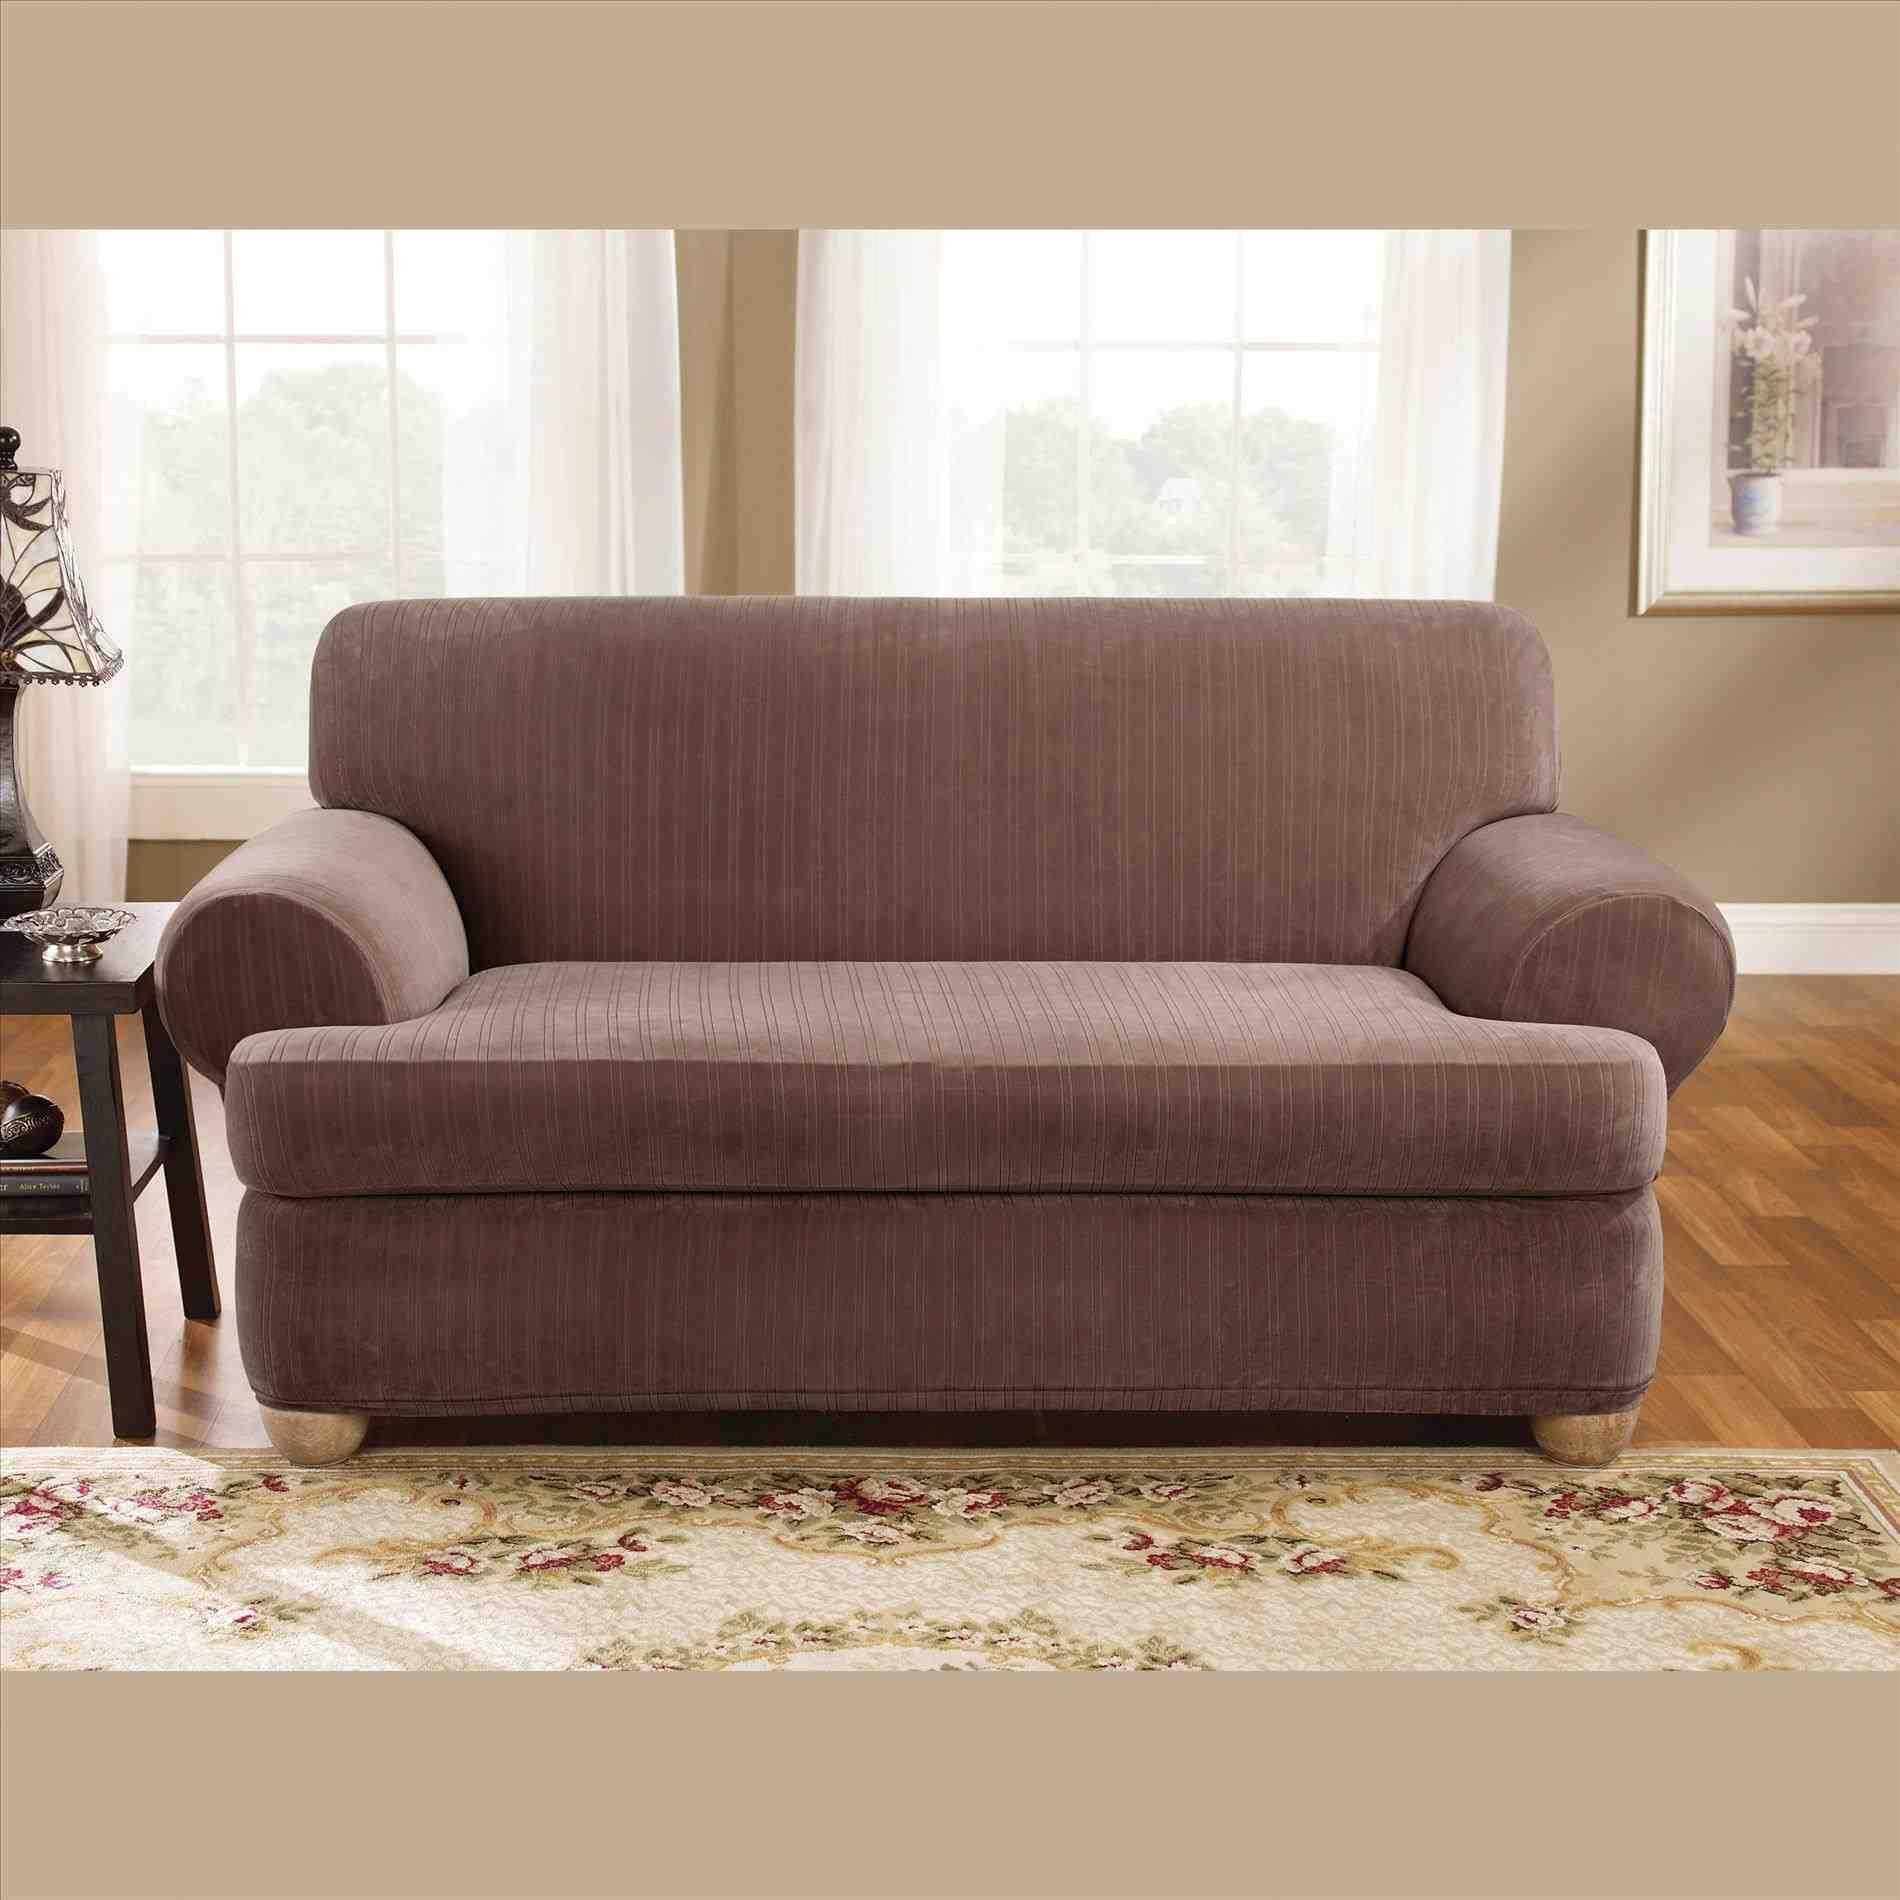 100 Arm Chairs Ideas Furniture Chair And A Half Love